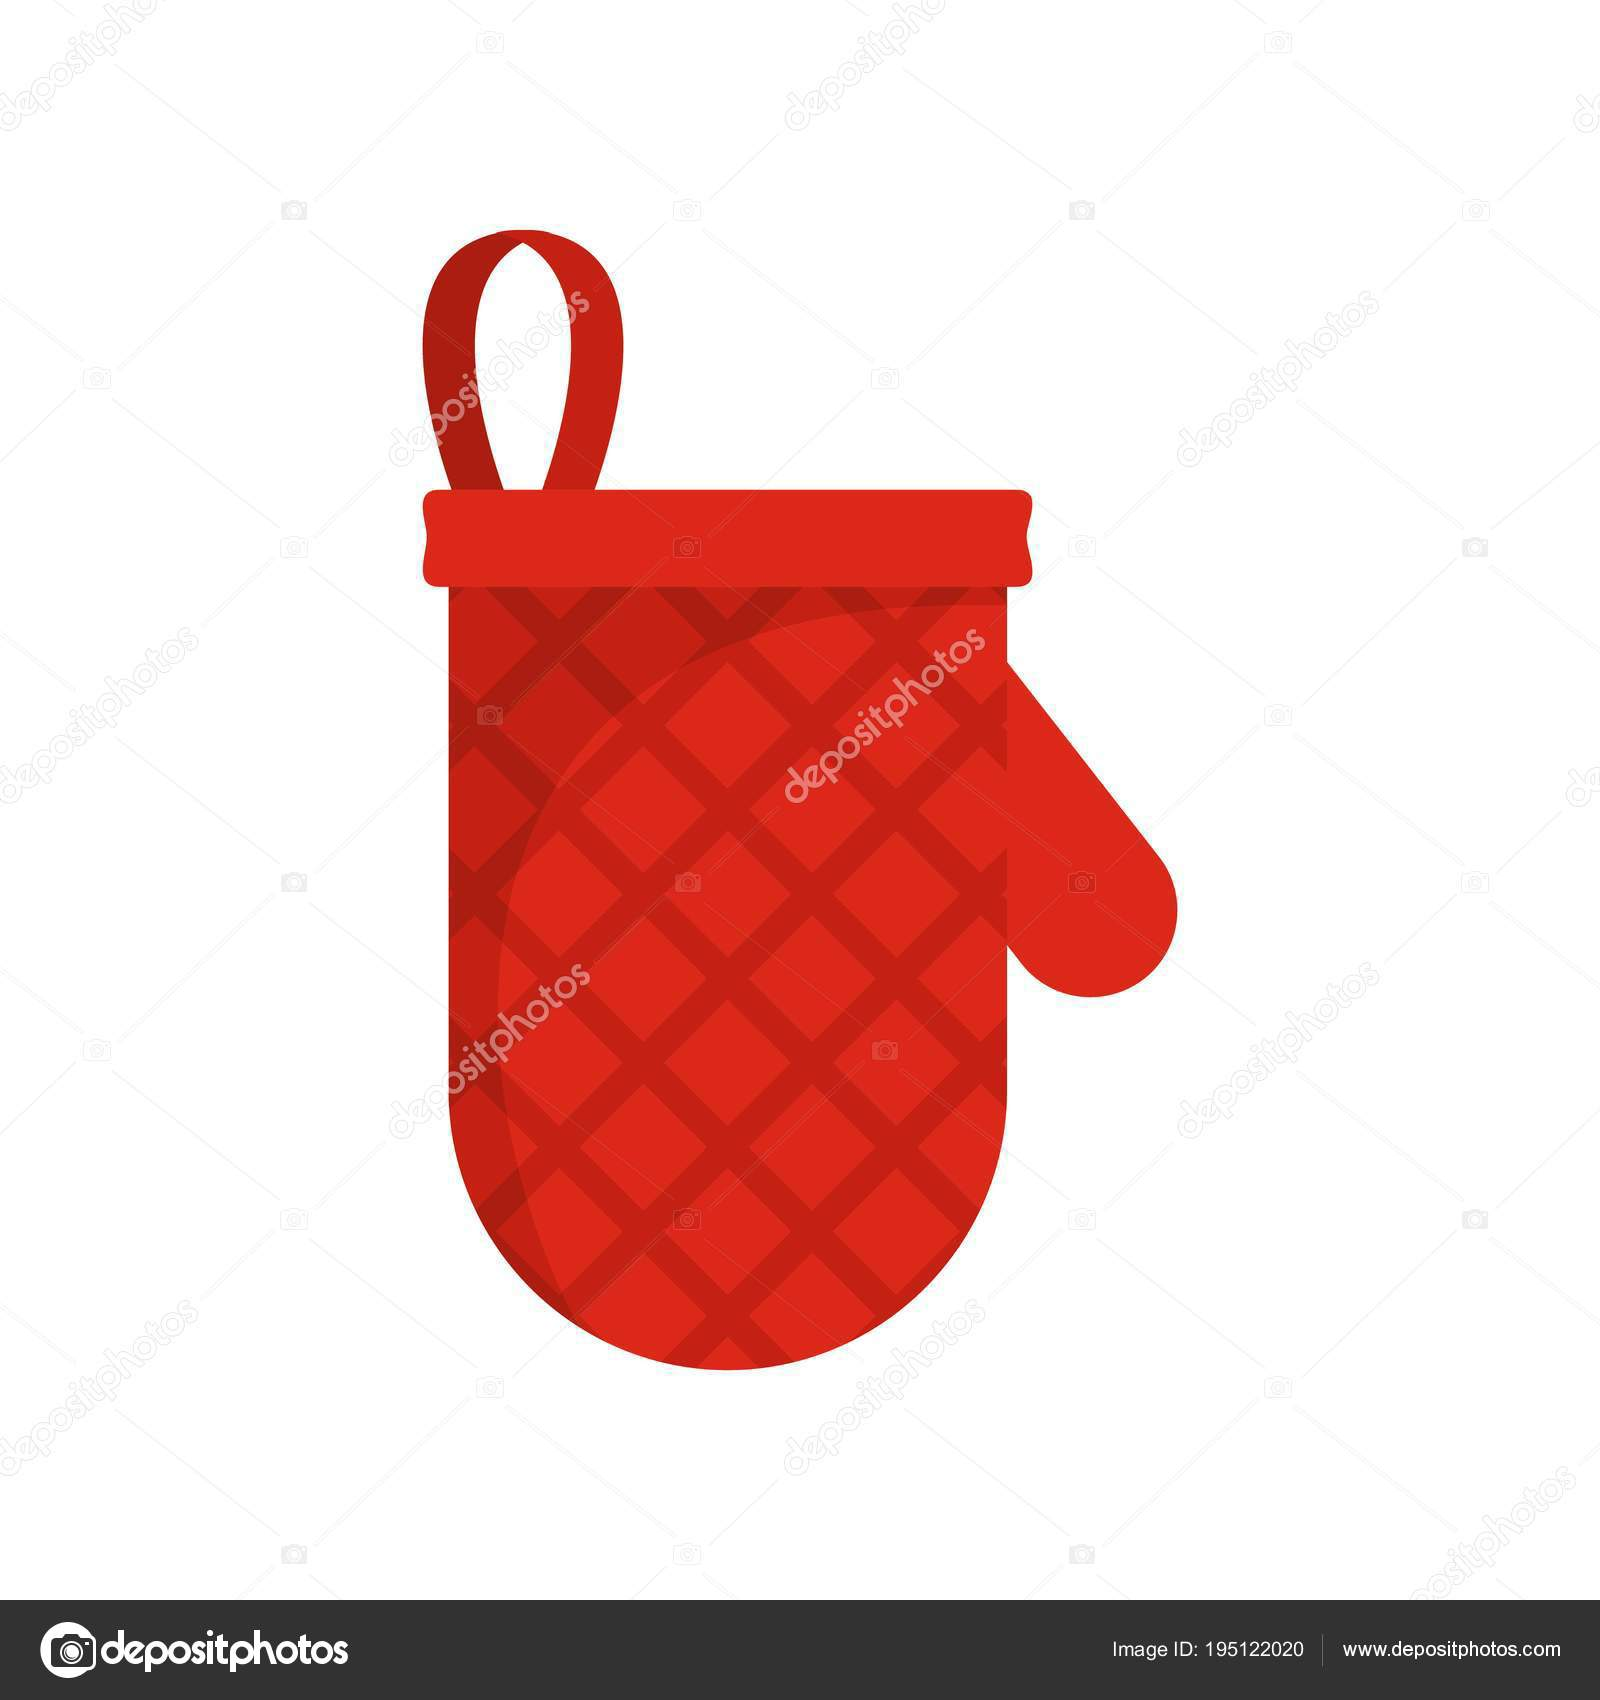 kitchen gloves ideas on a budget 厨房手套图标 平面风格 图库矢量图像 c anatolir 195122020 网络中的厨房手套矢量图标平面图 矢量图片anatolir